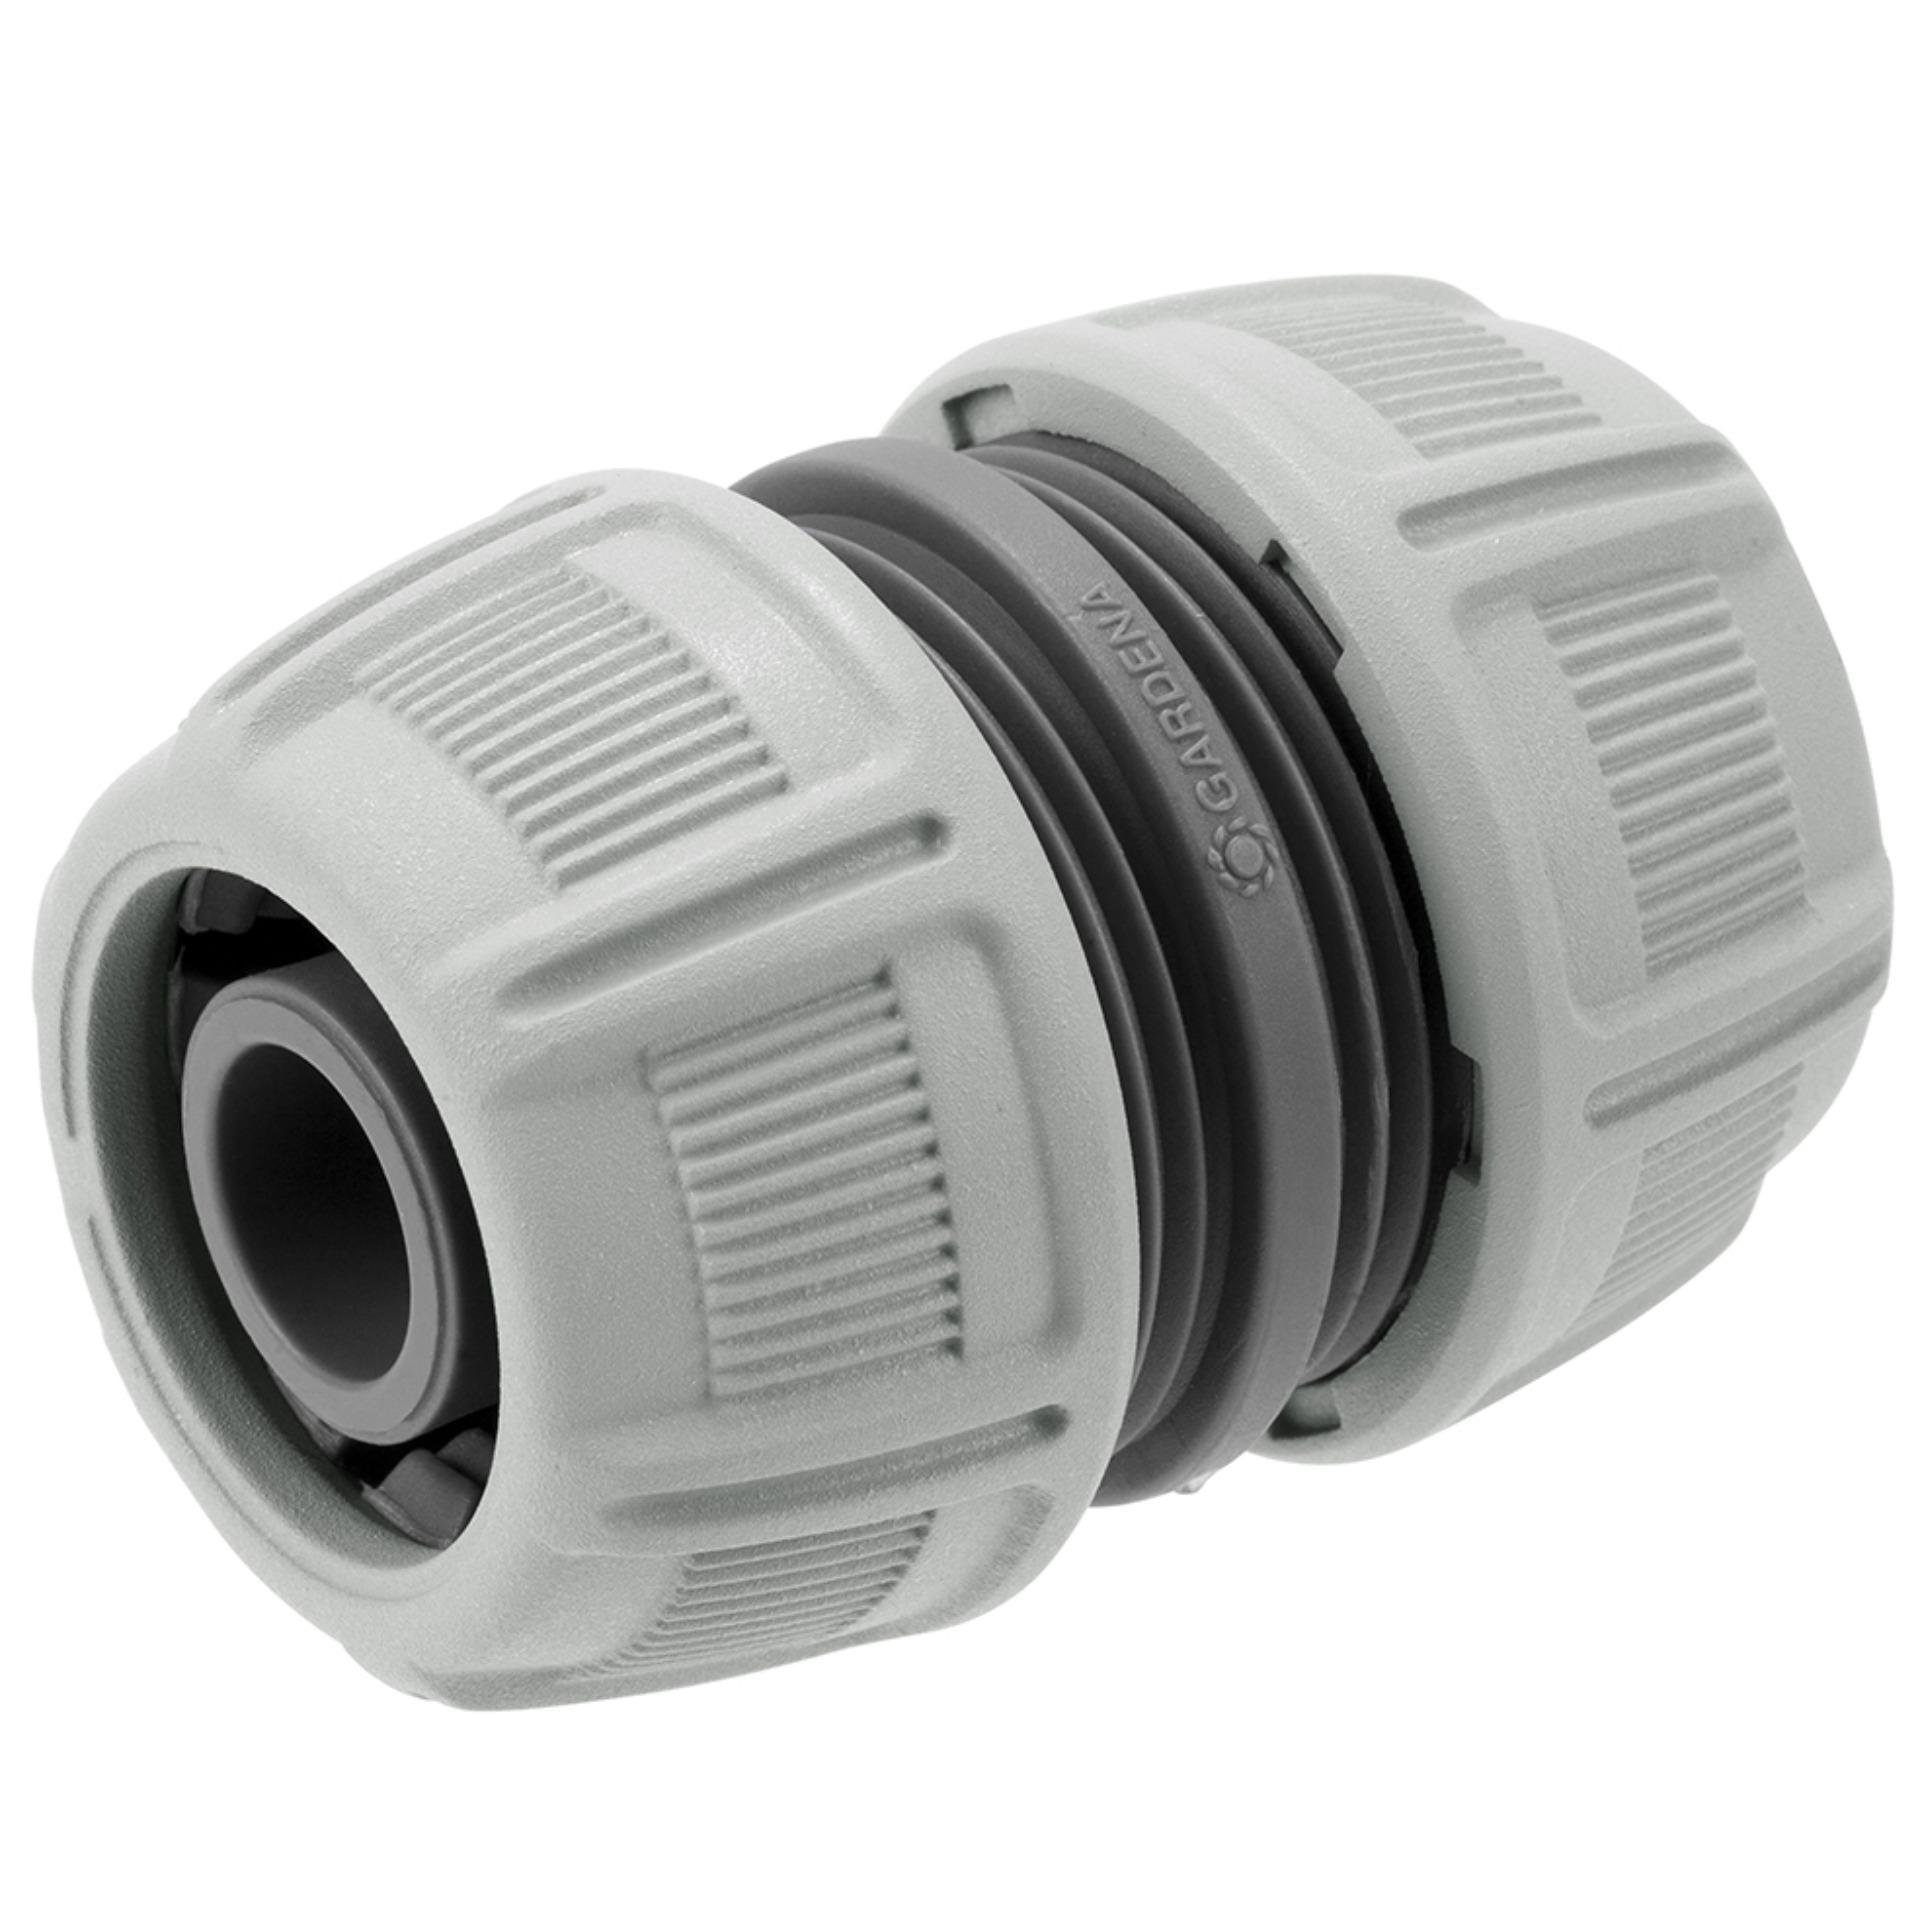 Cút sửa ống Gardena 18233-50 19mm